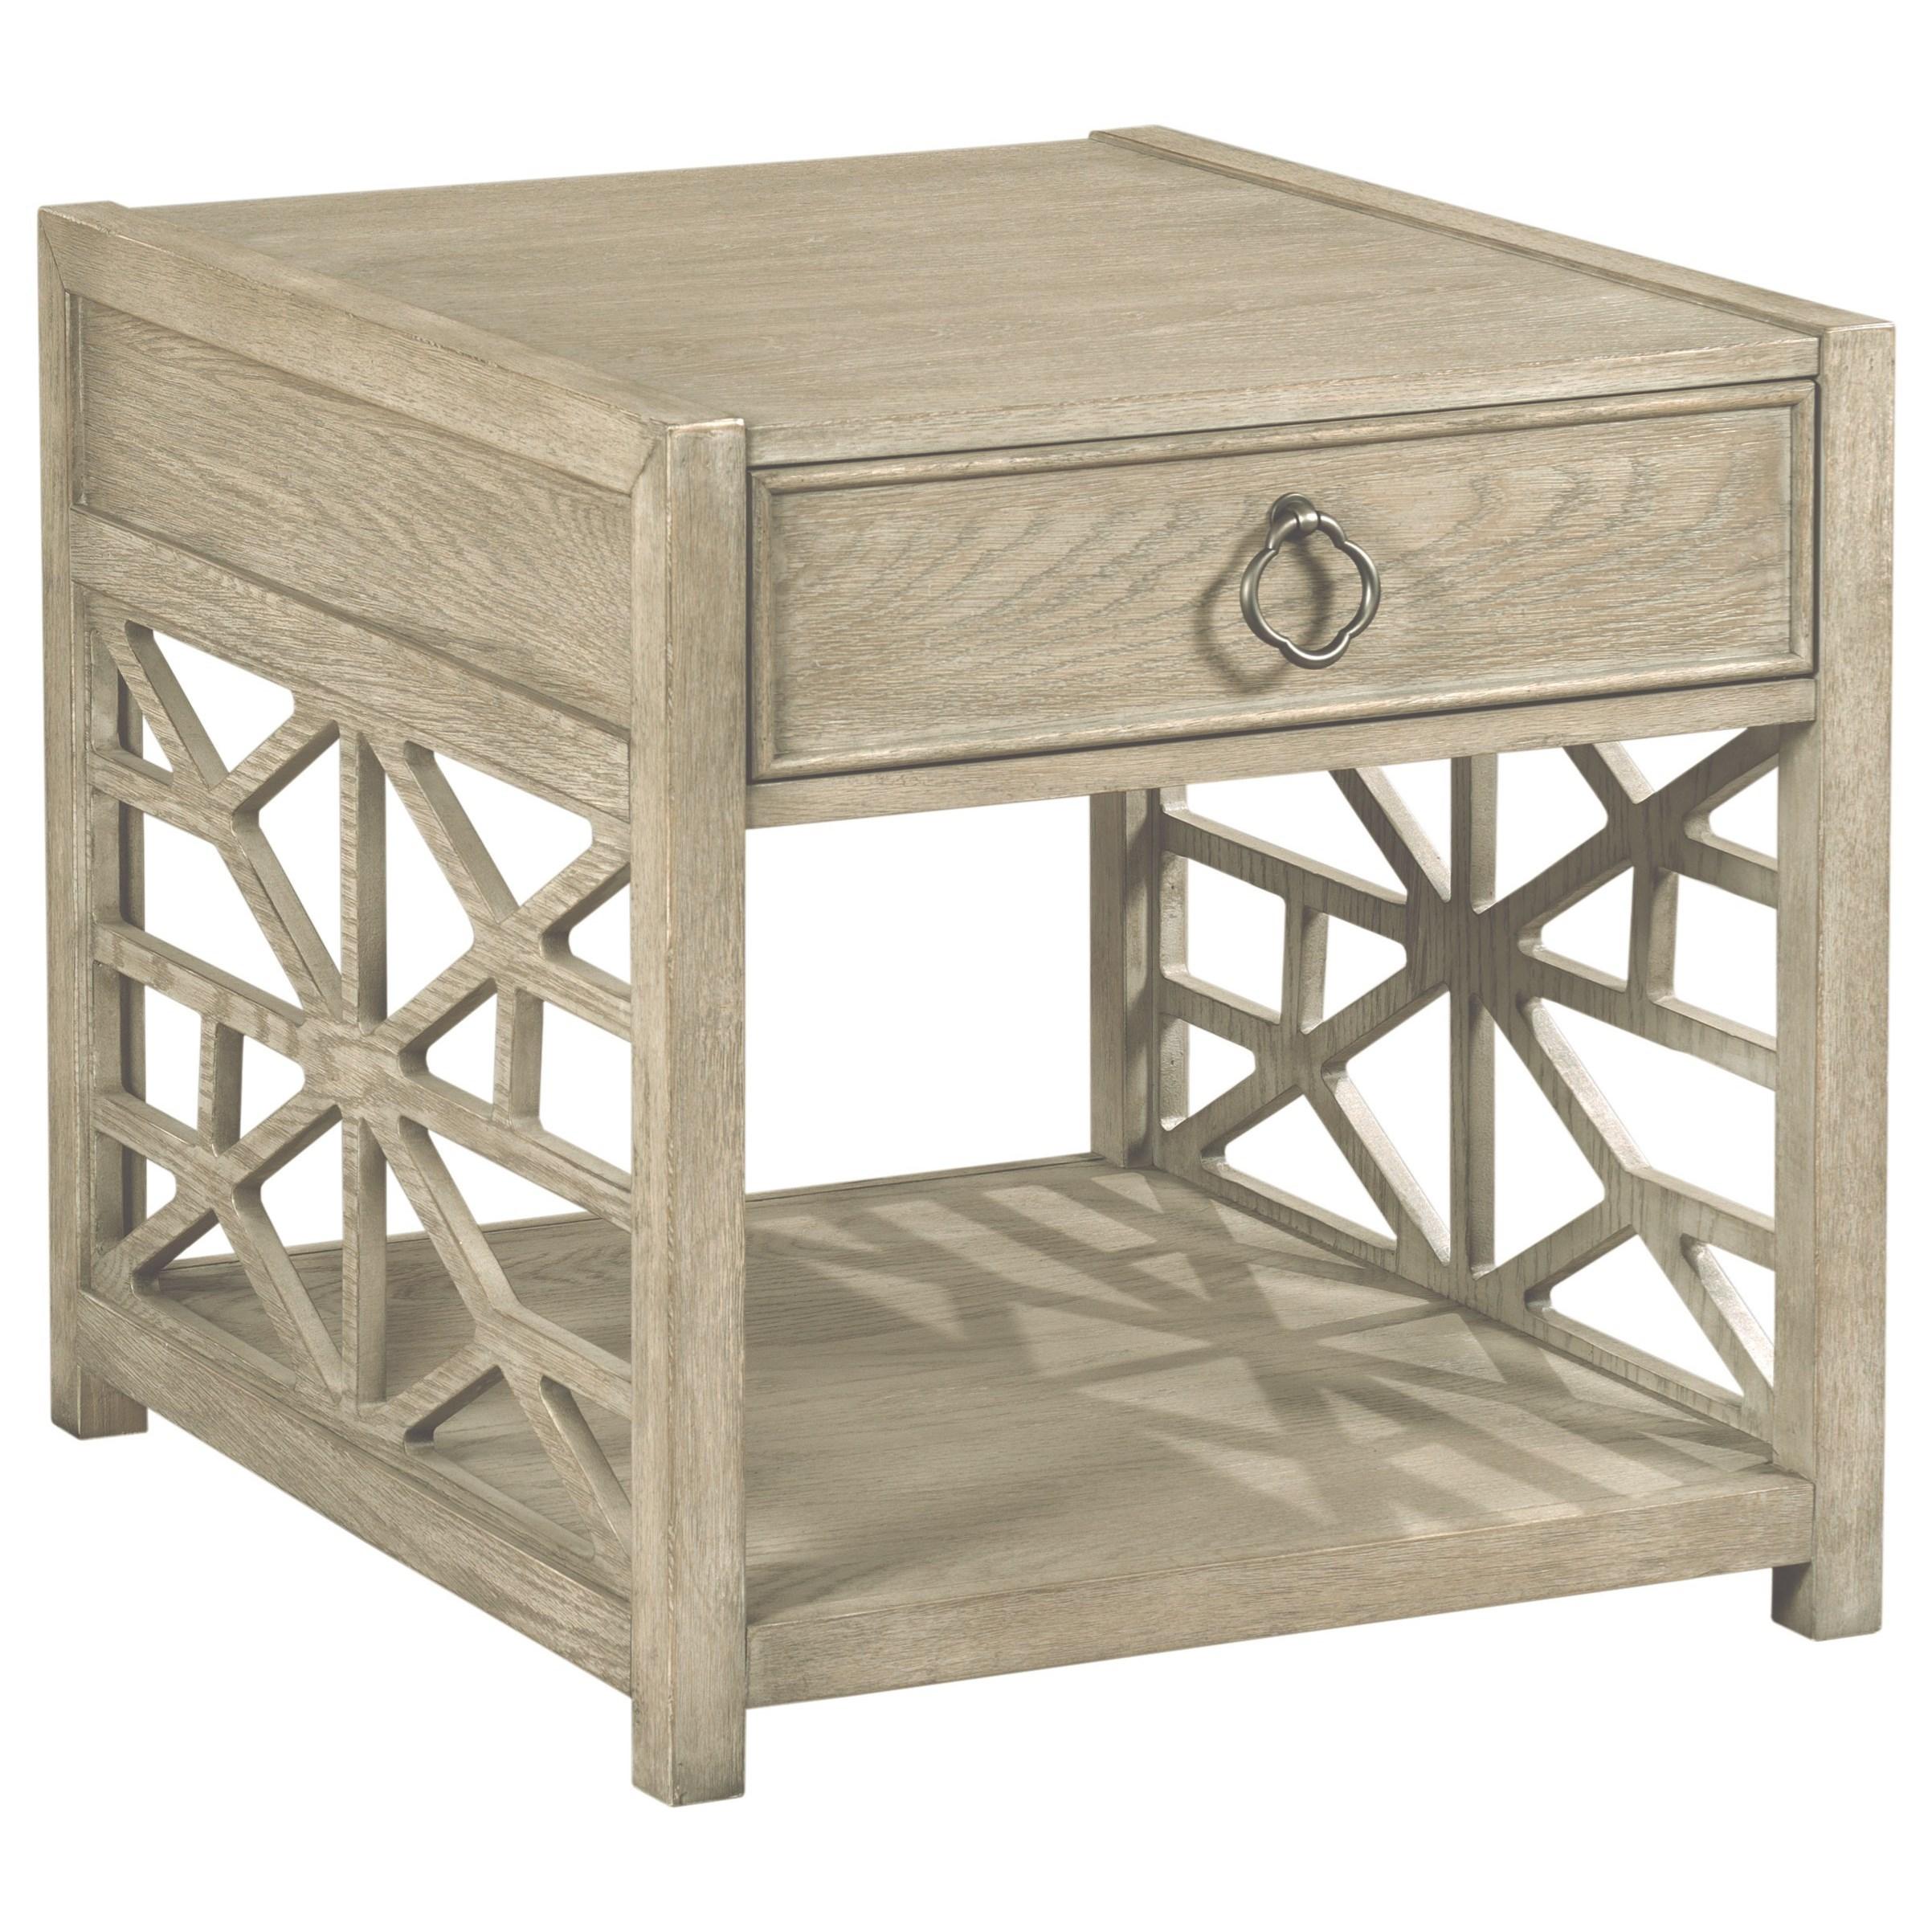 Vista Biscane Drawer End Table by American Drew at Darvin Furniture